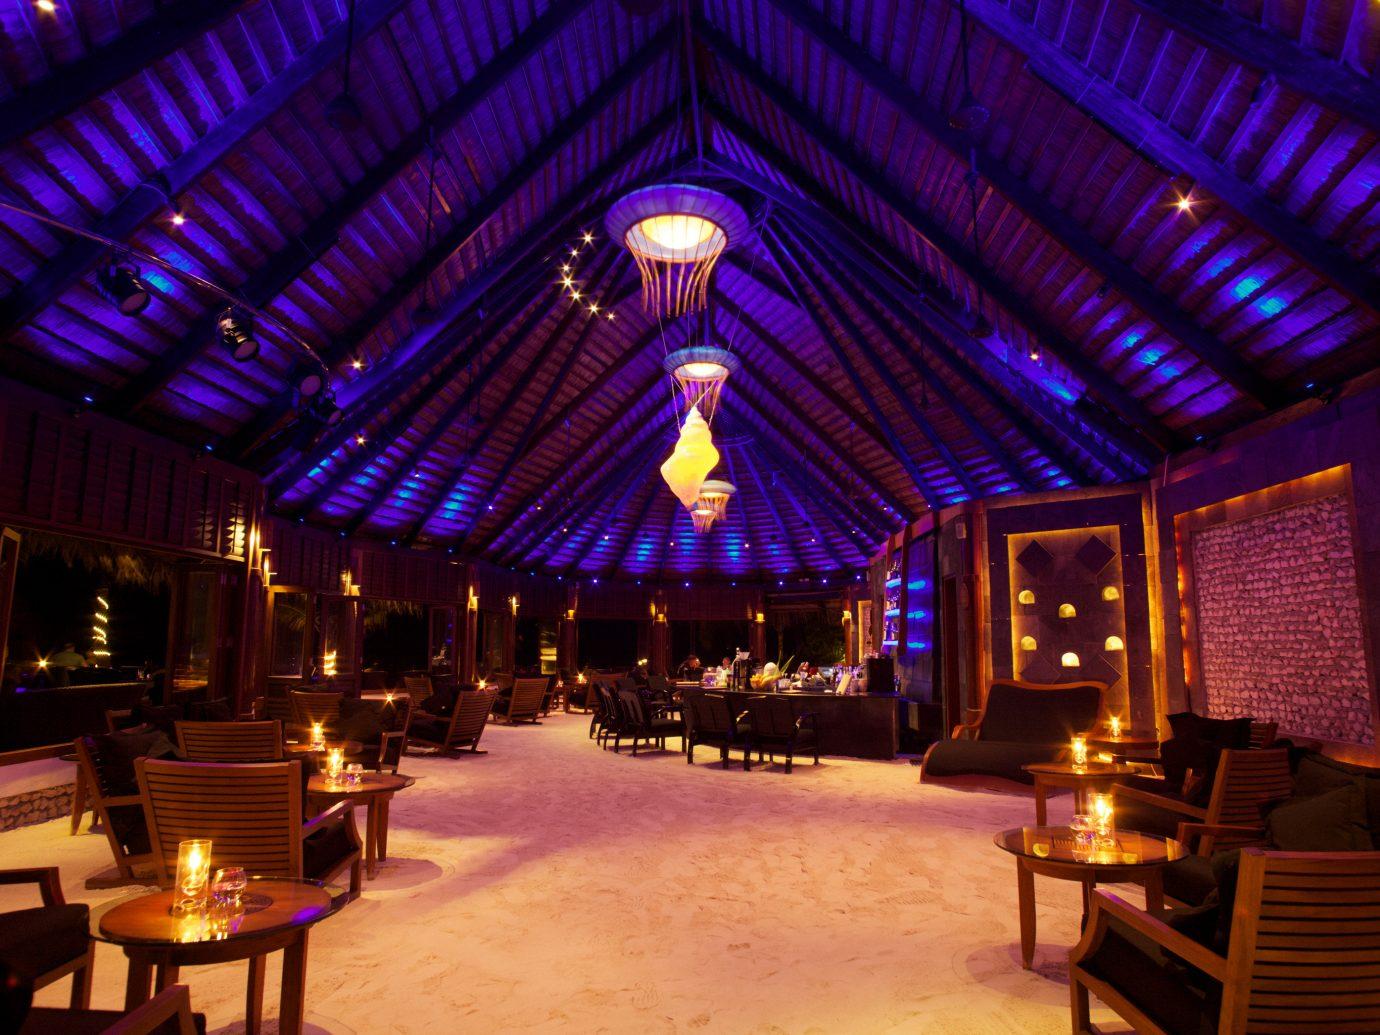 All-Inclusive Resorts Hotels indoor ceiling night Resort lighting nightclub estate restaurant several